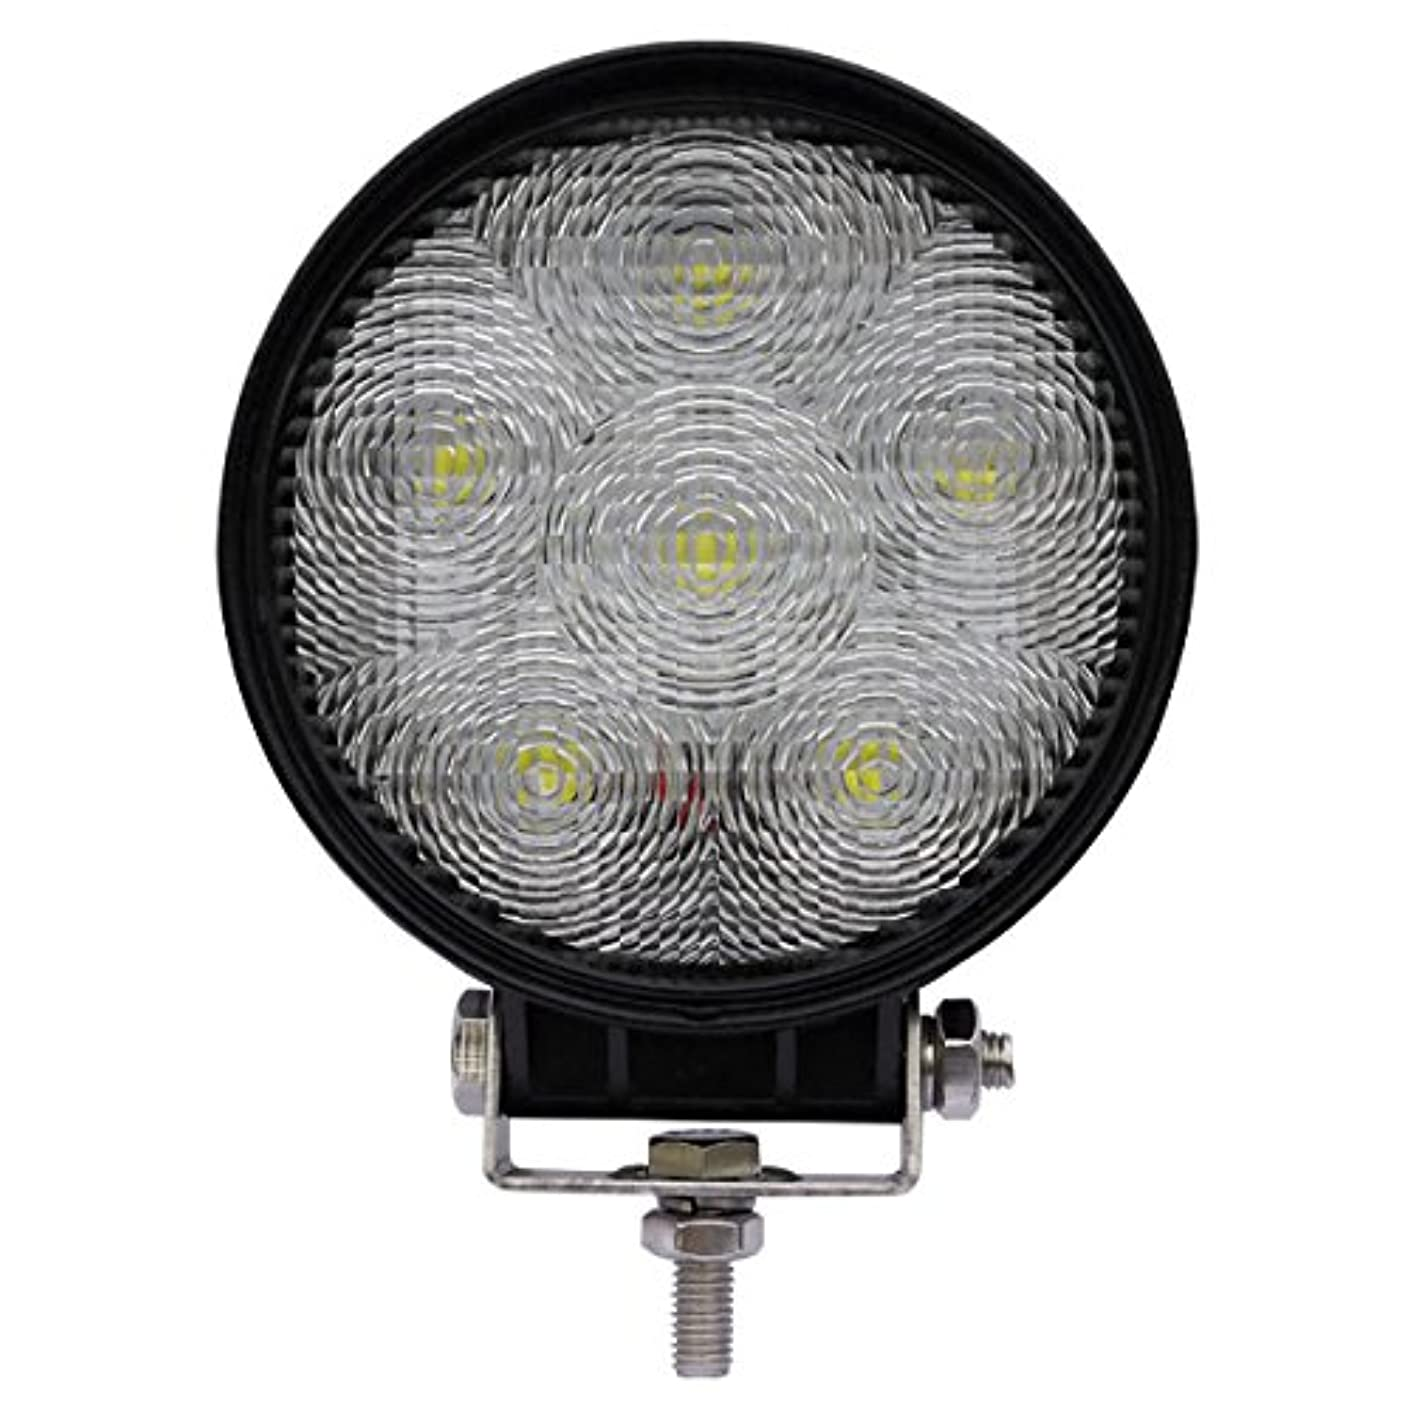 Kaper II L16-0069 Black LED Work Light